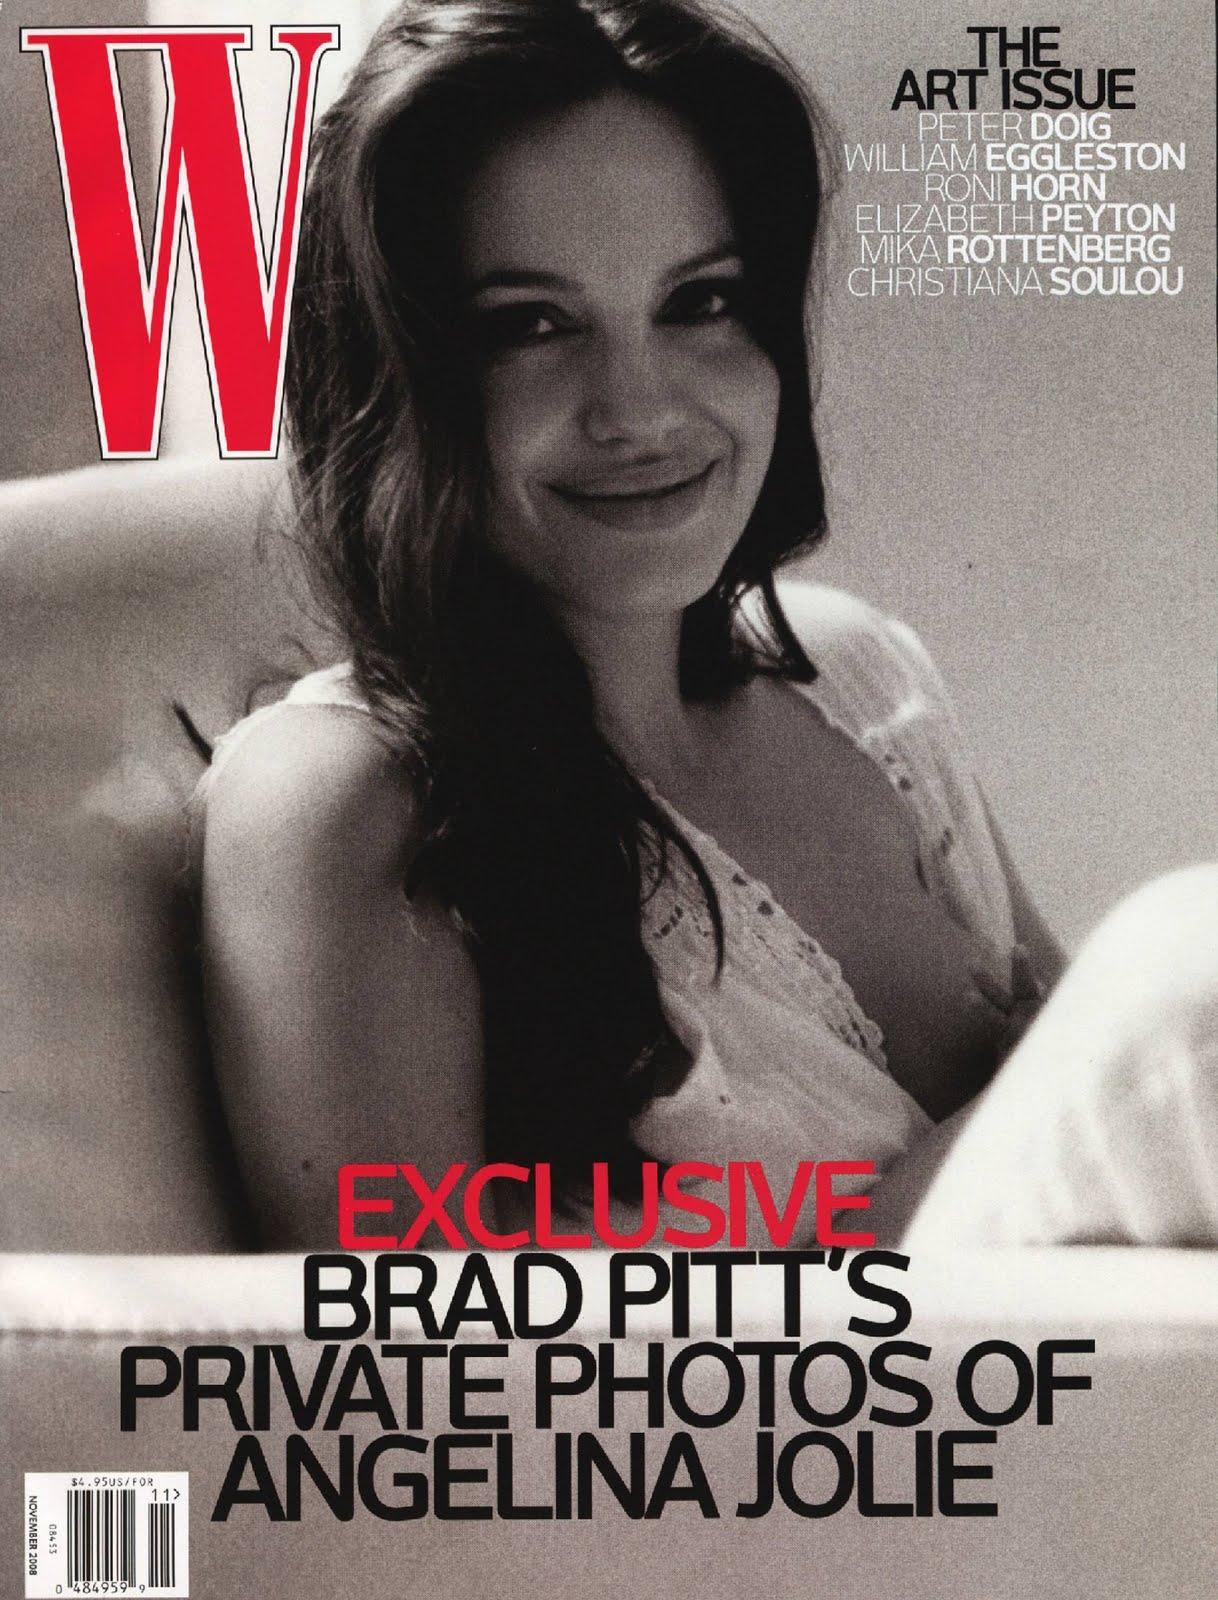 http://2.bp.blogspot.com/-c85jjEEb_d4/TaAVPYu7z6I/AAAAAAAAAOE/q6eXs_cEA9c/s1600/Angelina_Jolie_-_W_magazine_cover.jpg